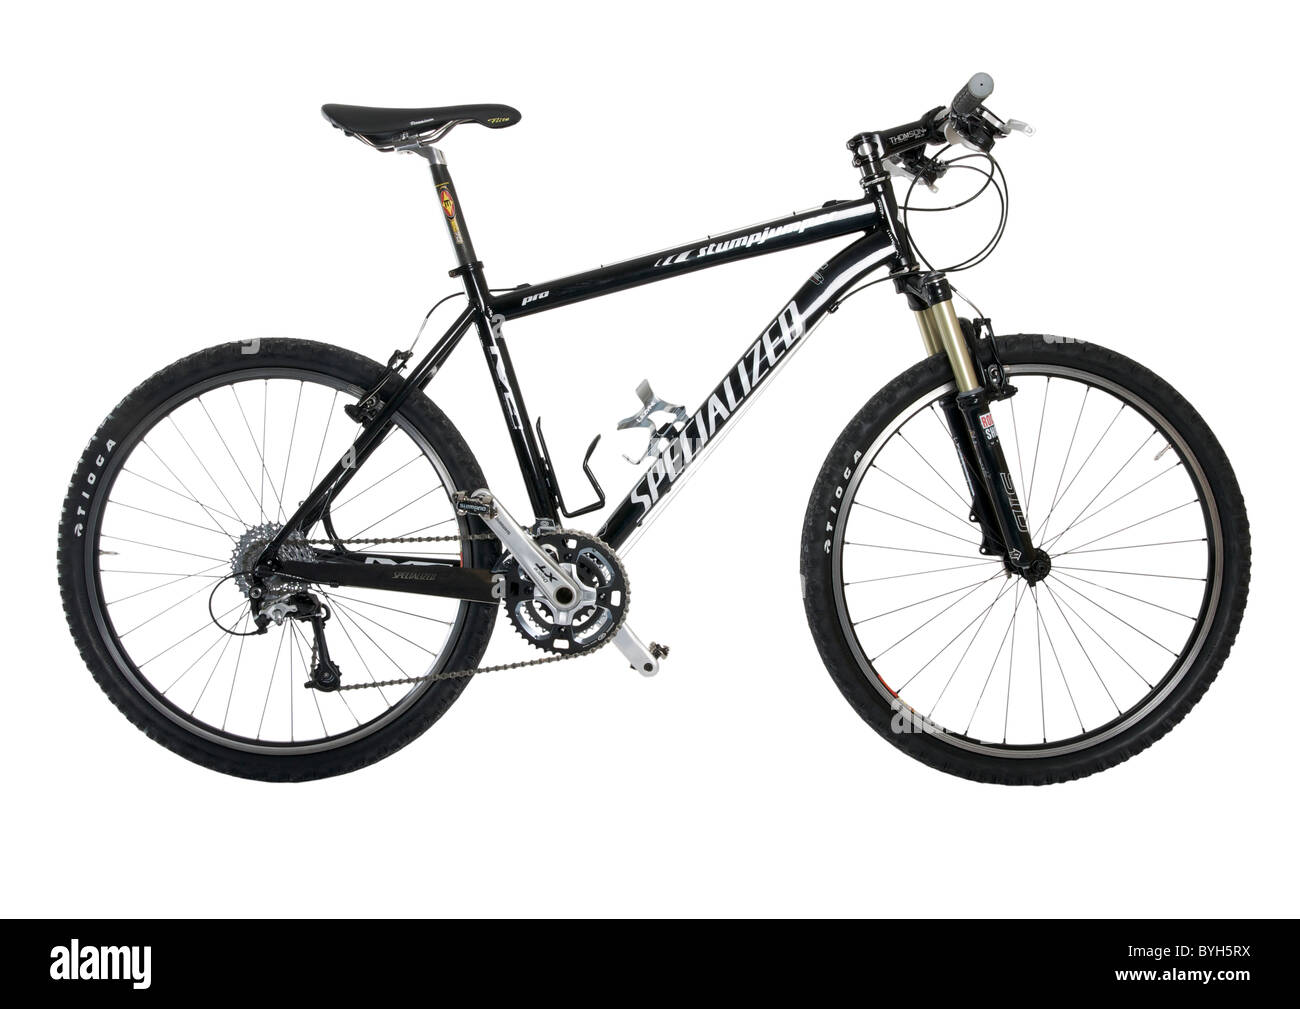 Hardtail mountain bike on white background - Stock Image